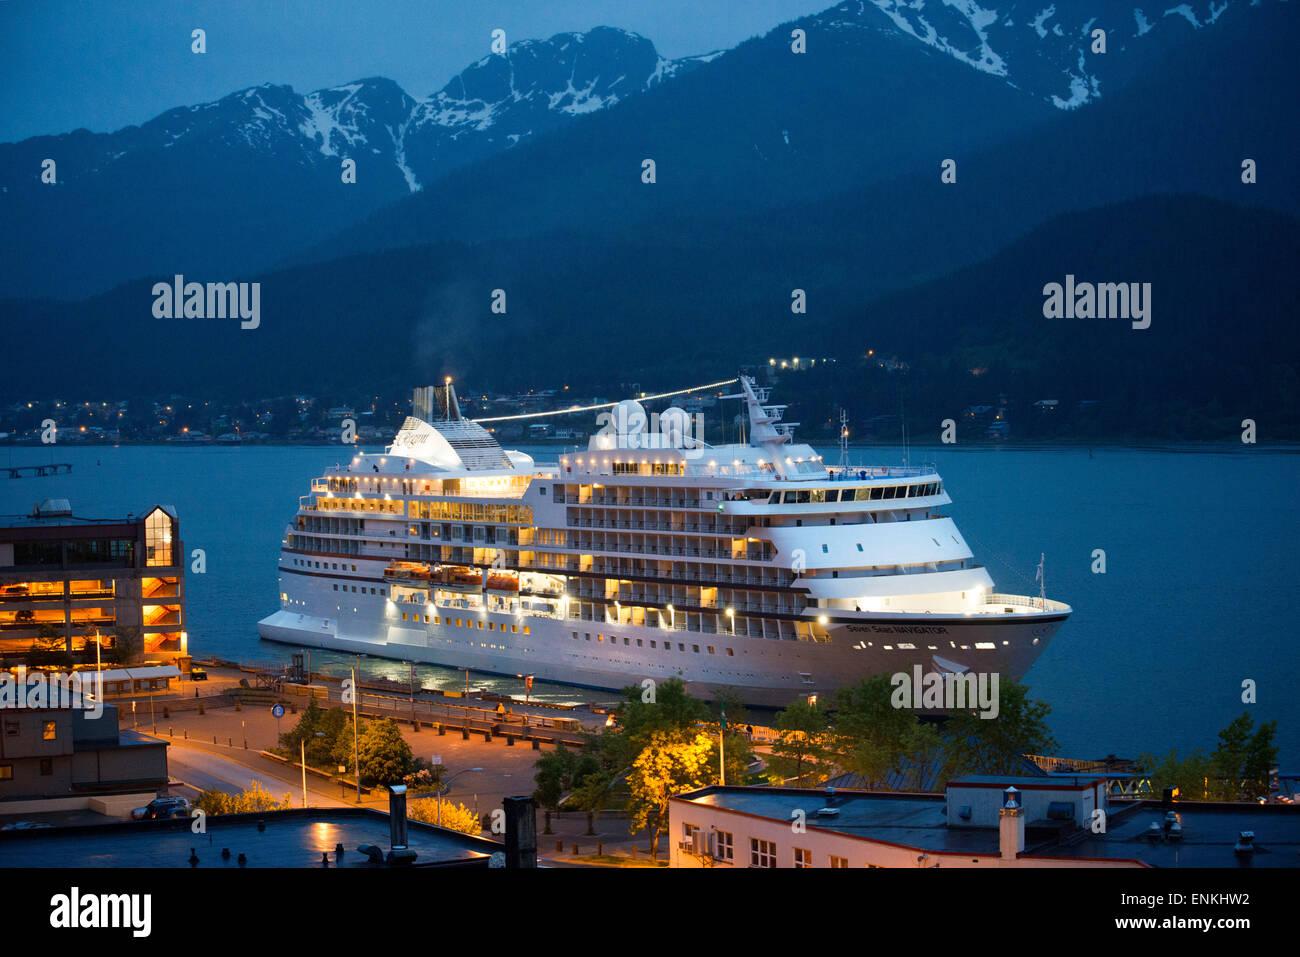 View of the pier and downtown of Juneau, Alaska. Downtown Juneau sits snugly between Mount Juneau, Mount Roberts Stock Photo